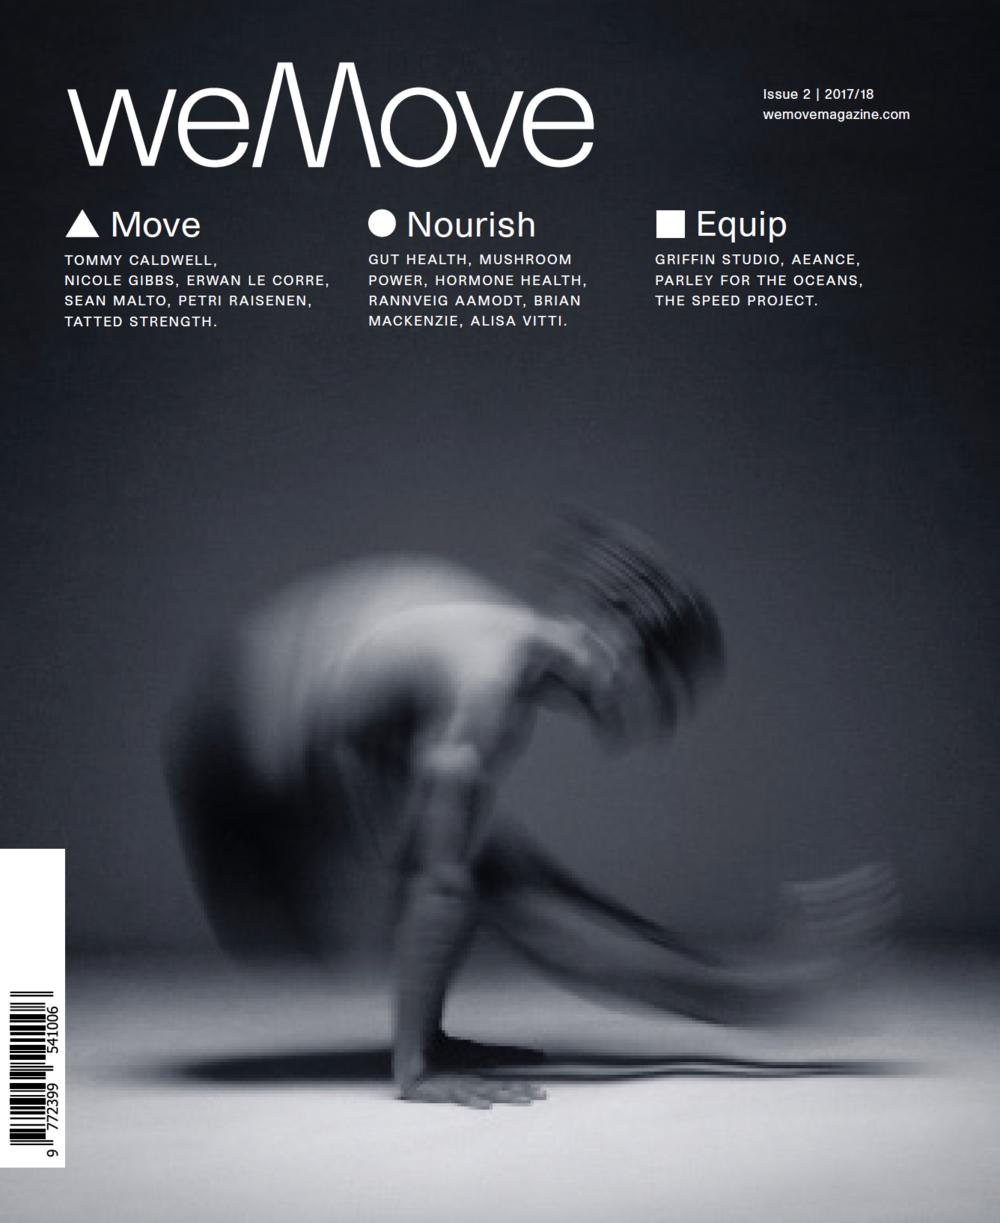 WEMOVE ISSUE 2 PRE-ORDER, SHIPS MID-NOVEMBER